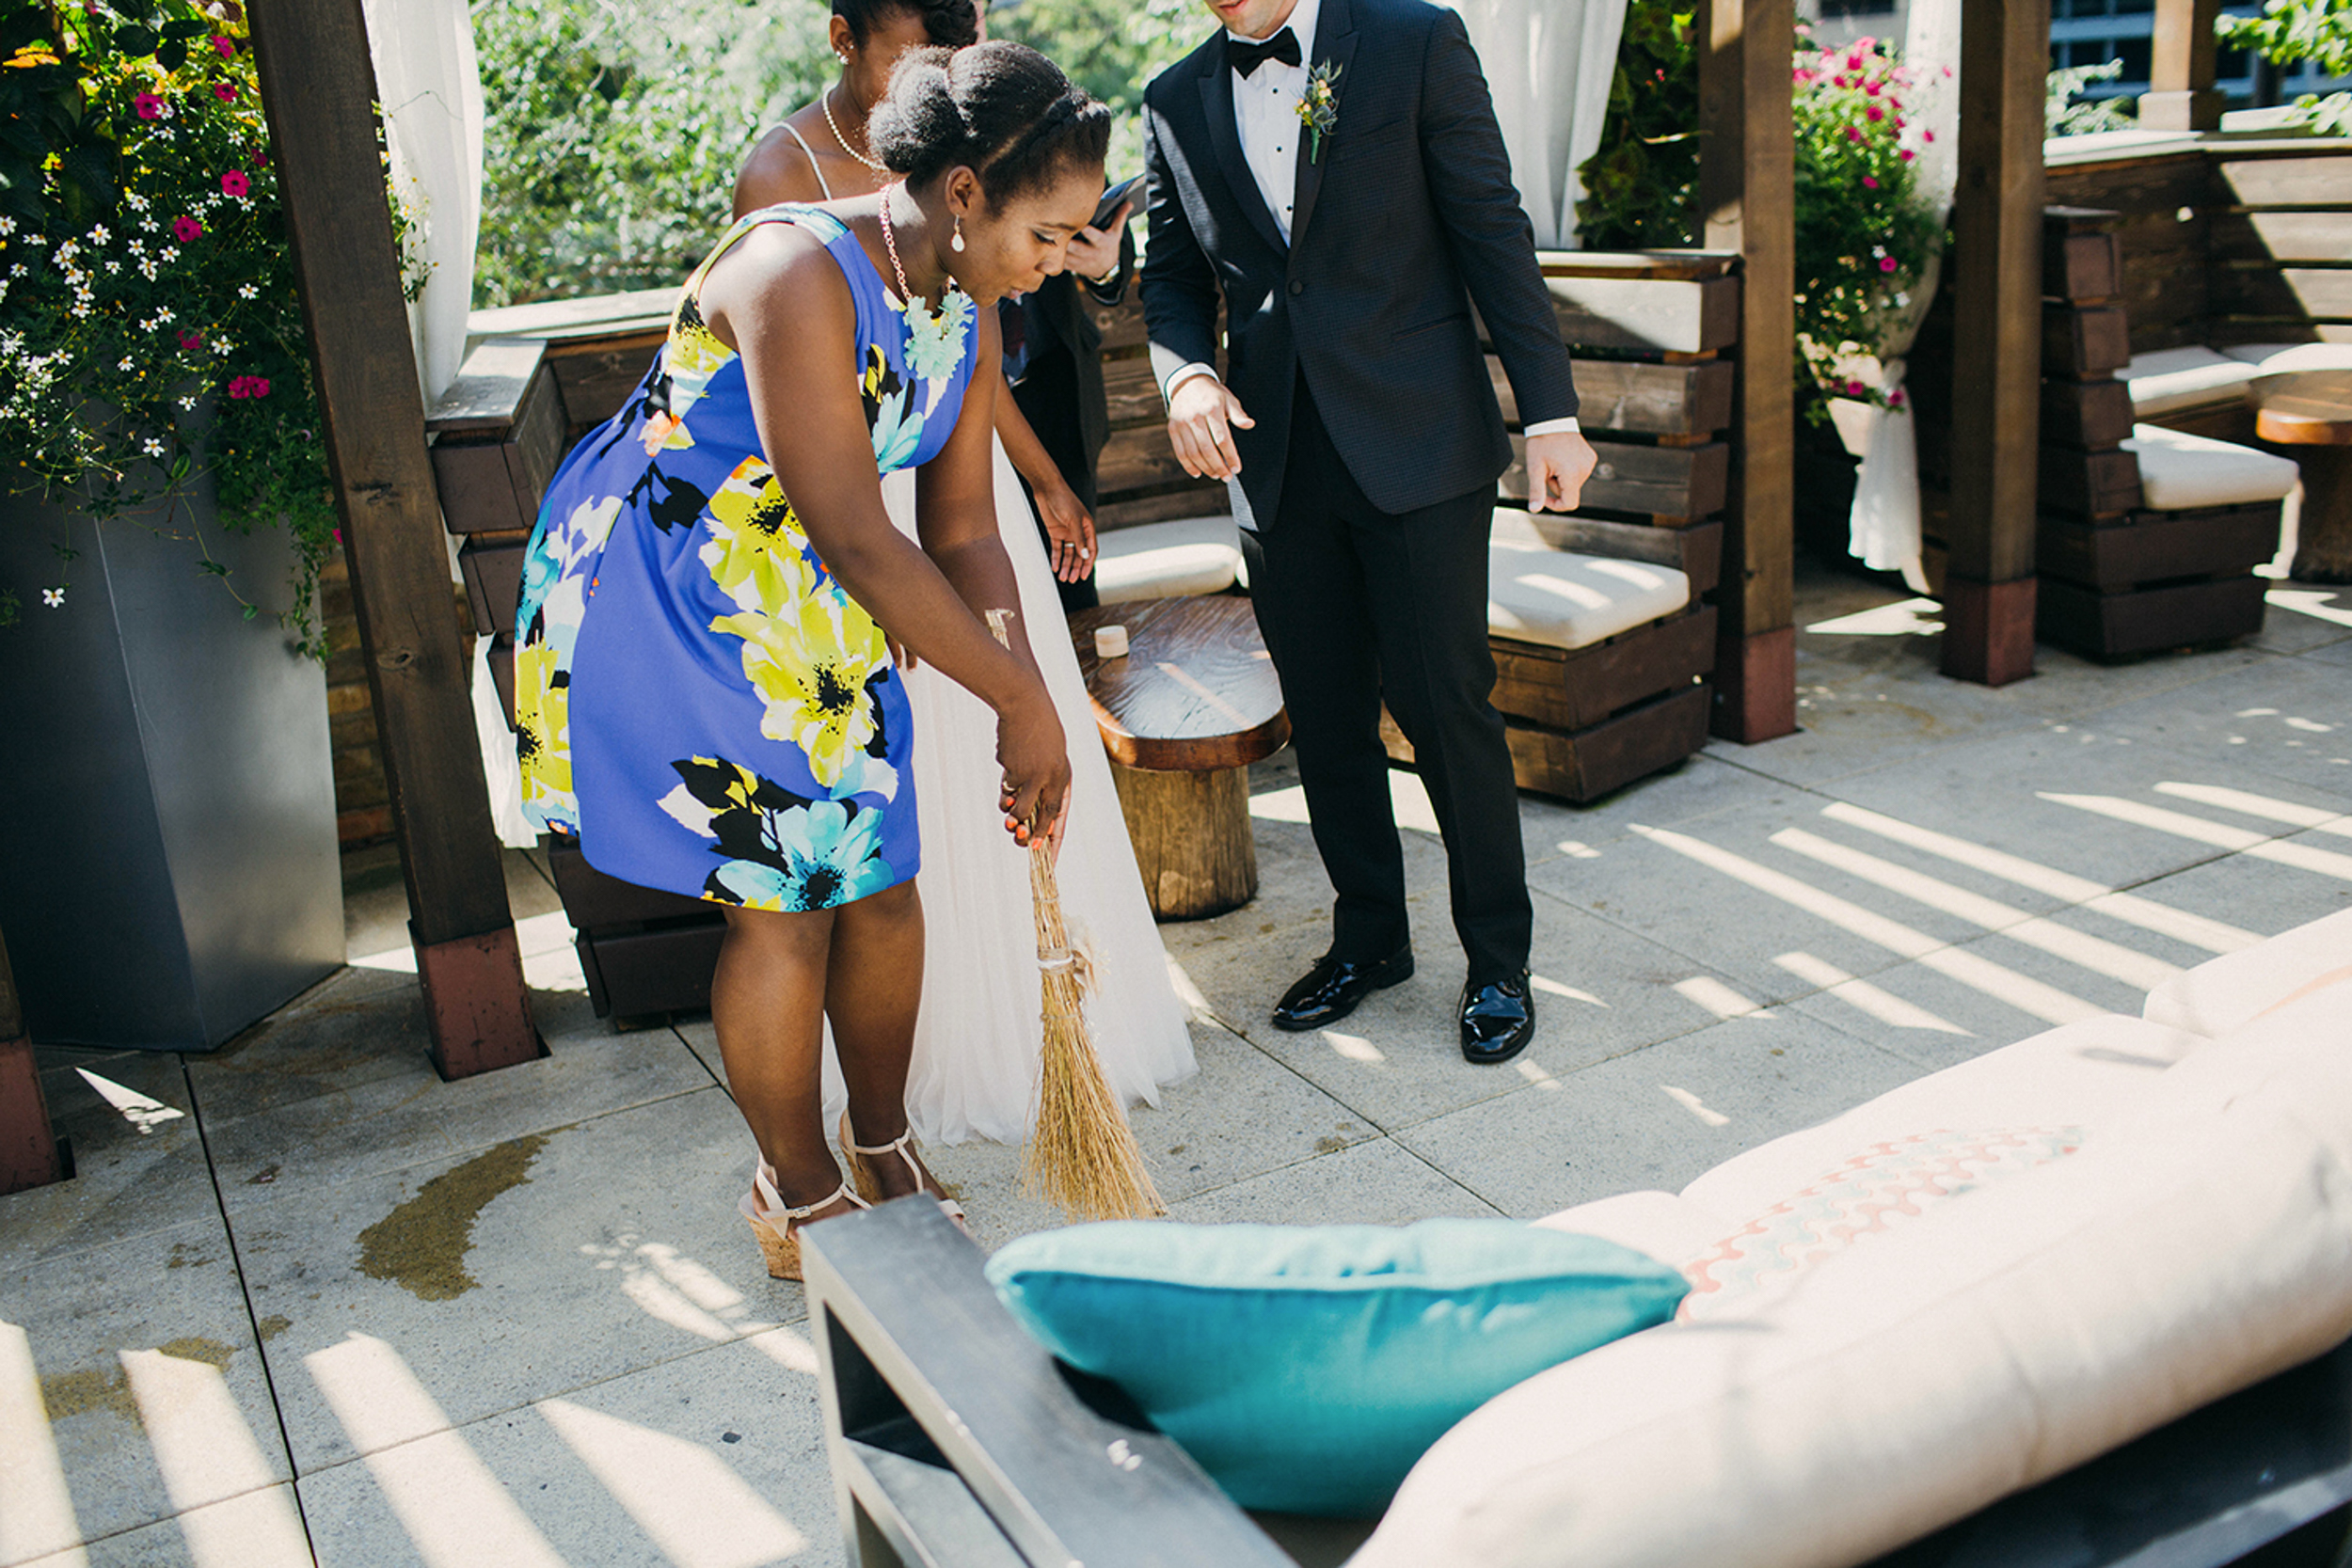 chicago.wedding.urban.intimate.zed451.lake.milton olive park-52.jpg